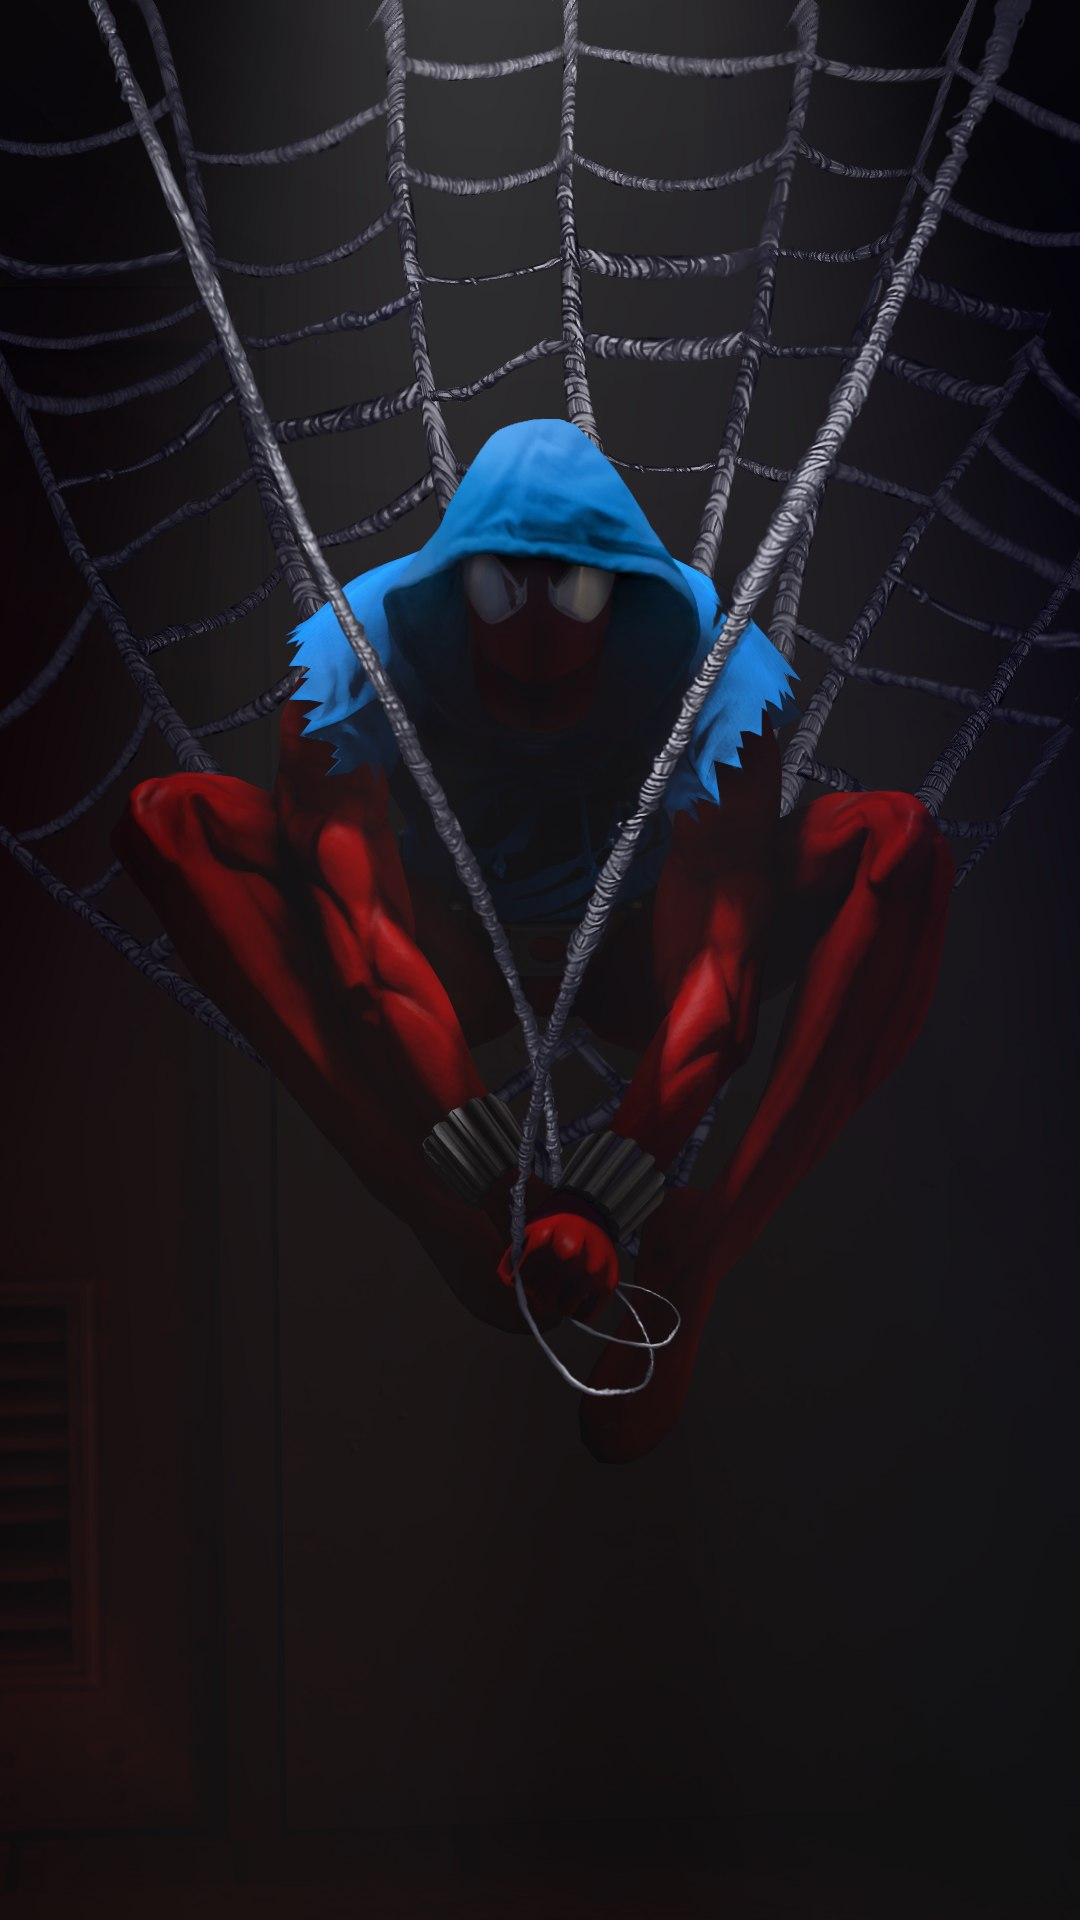 The Dark Spiderman iPhone Wallpaper